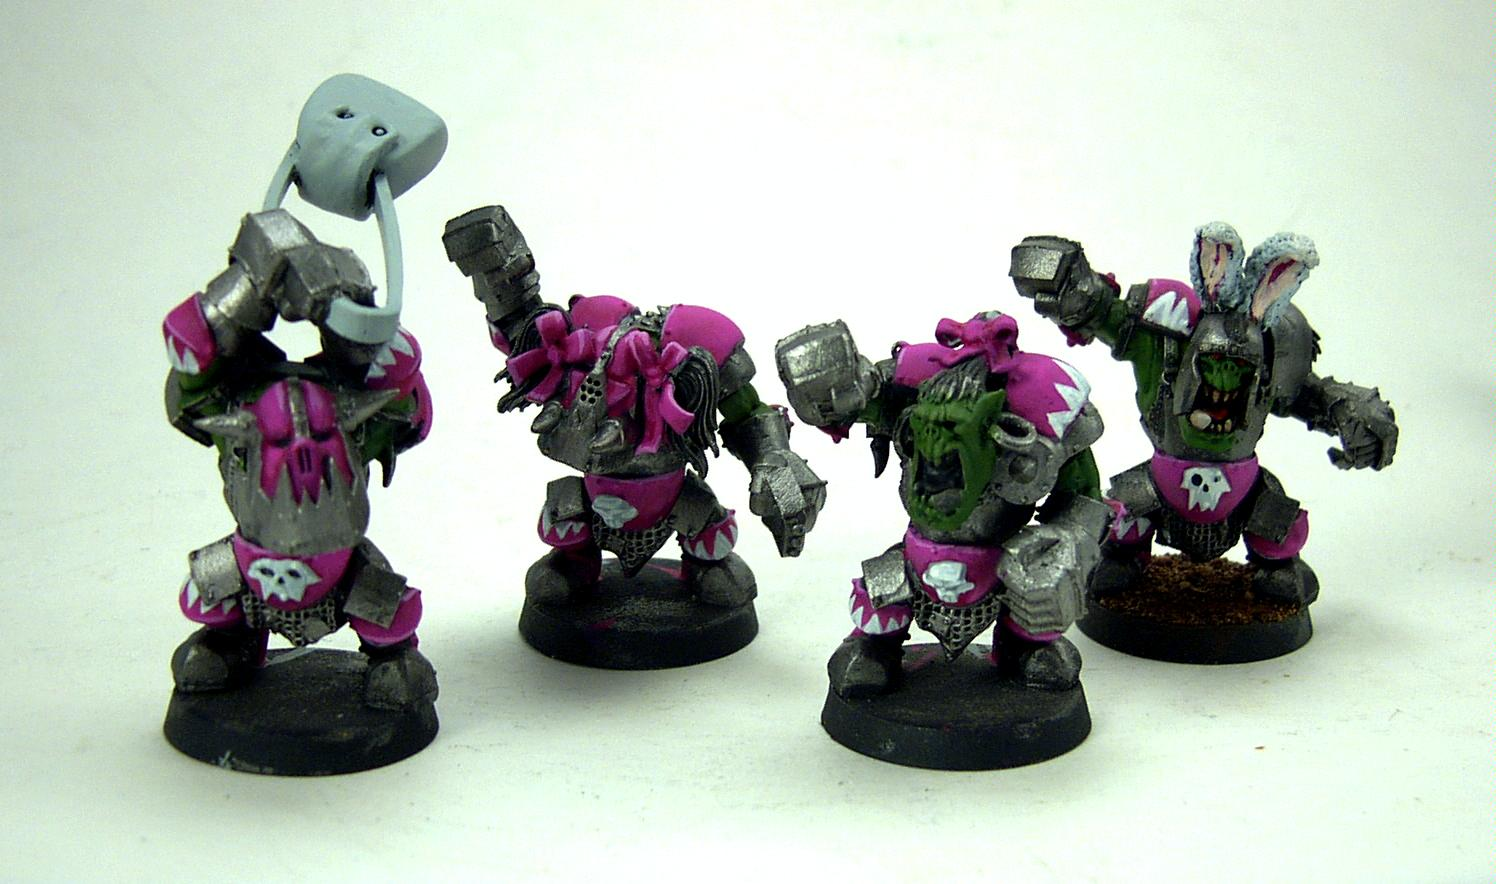 Blood Bowl, Bunny, Orcs, Pink, Purse